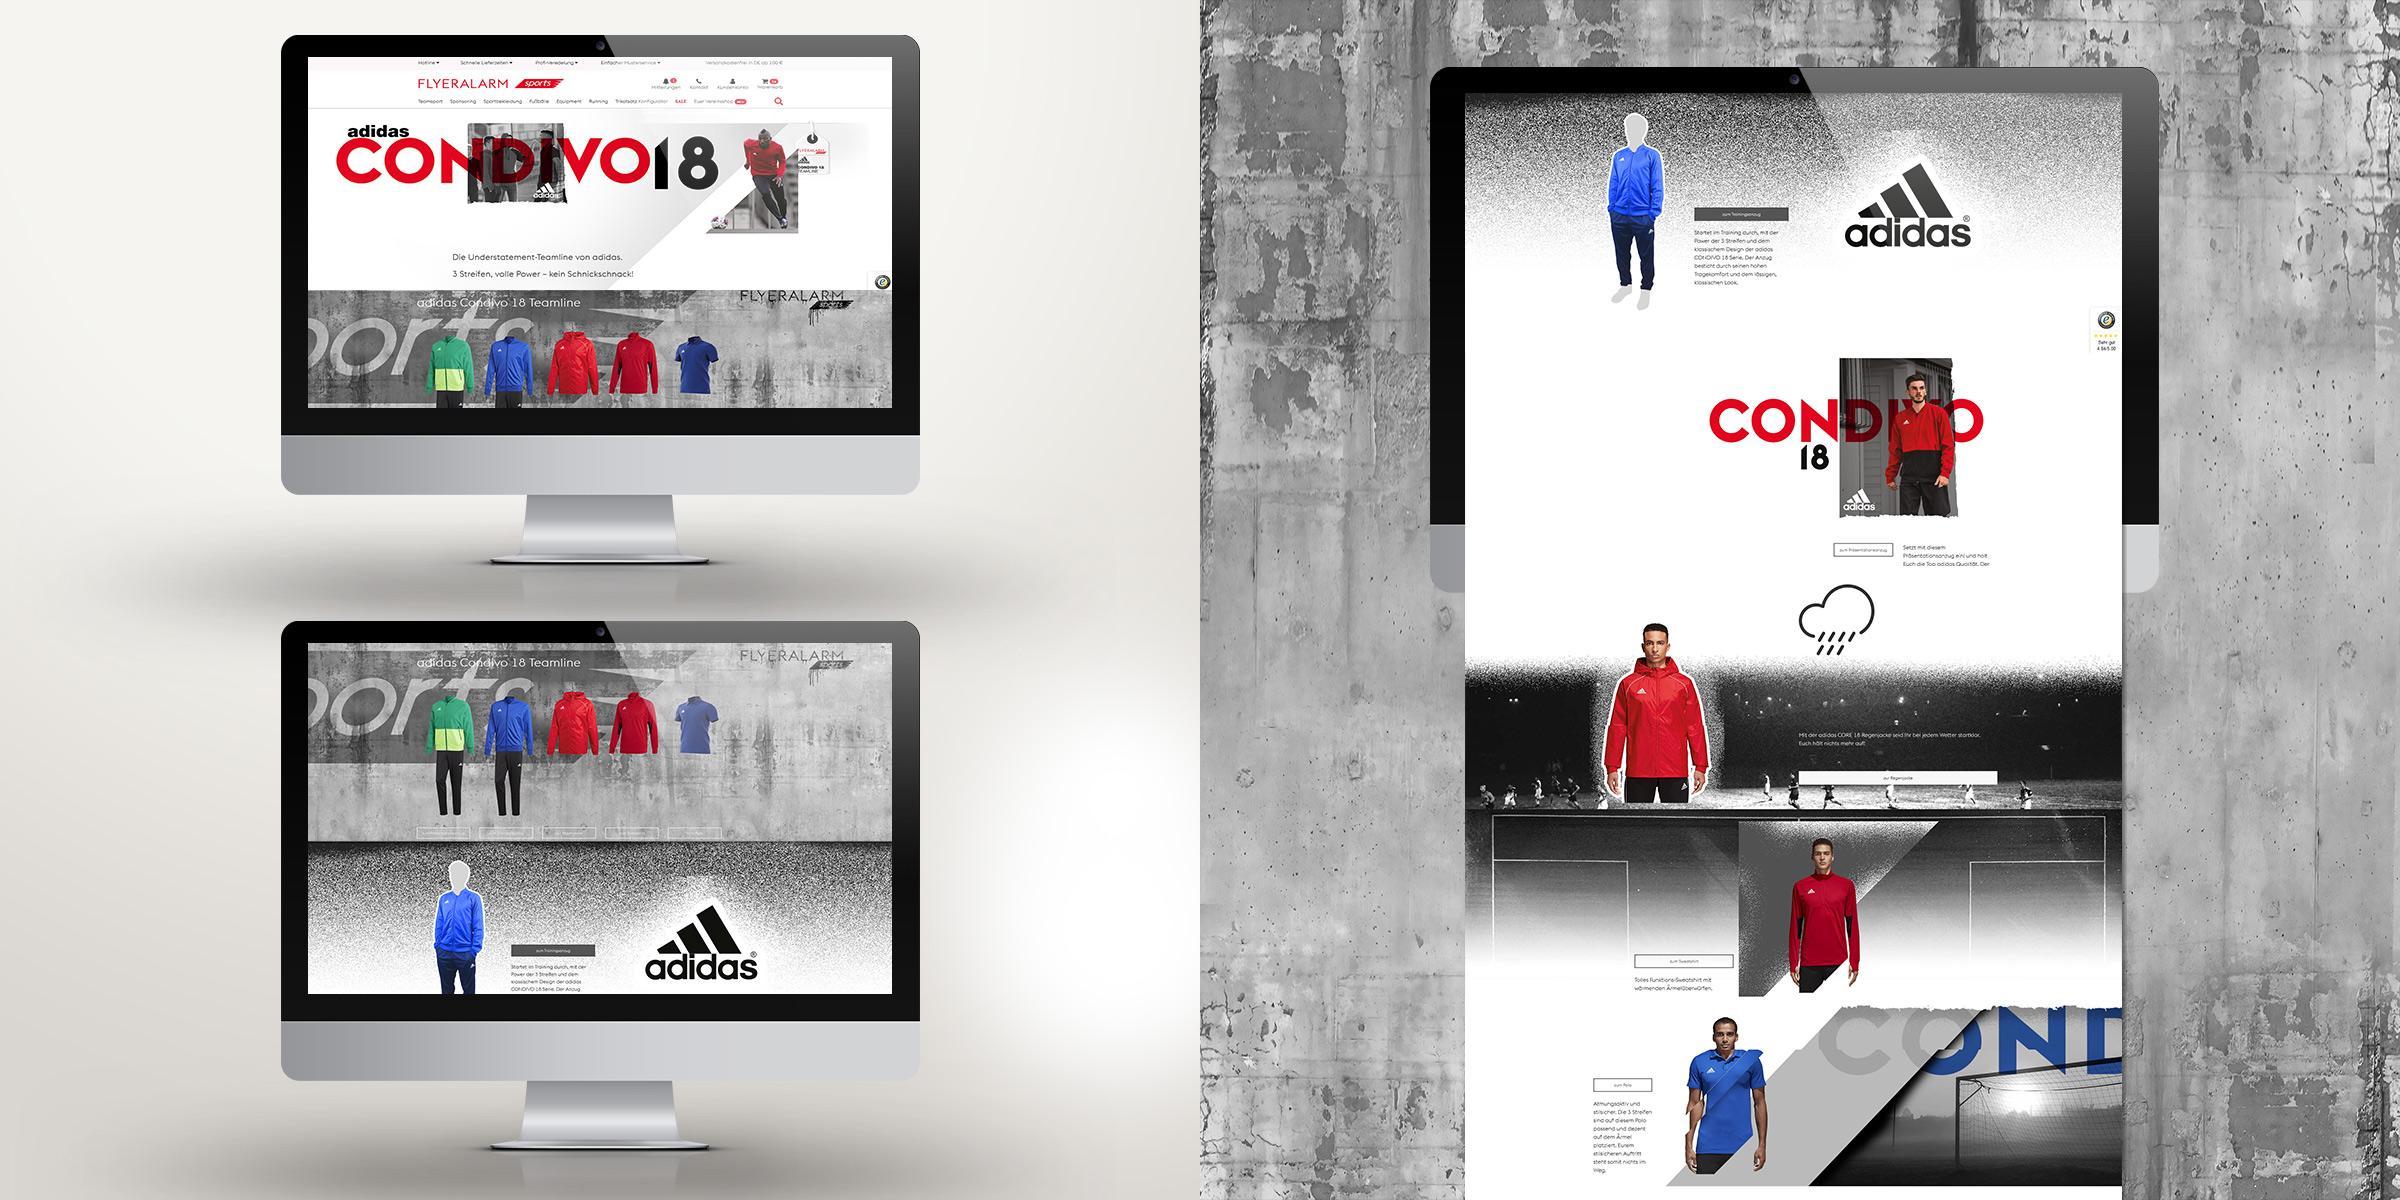 7 gfd gregor fenger designworks for fa sports de branding corporate design smm sma social media marketing online